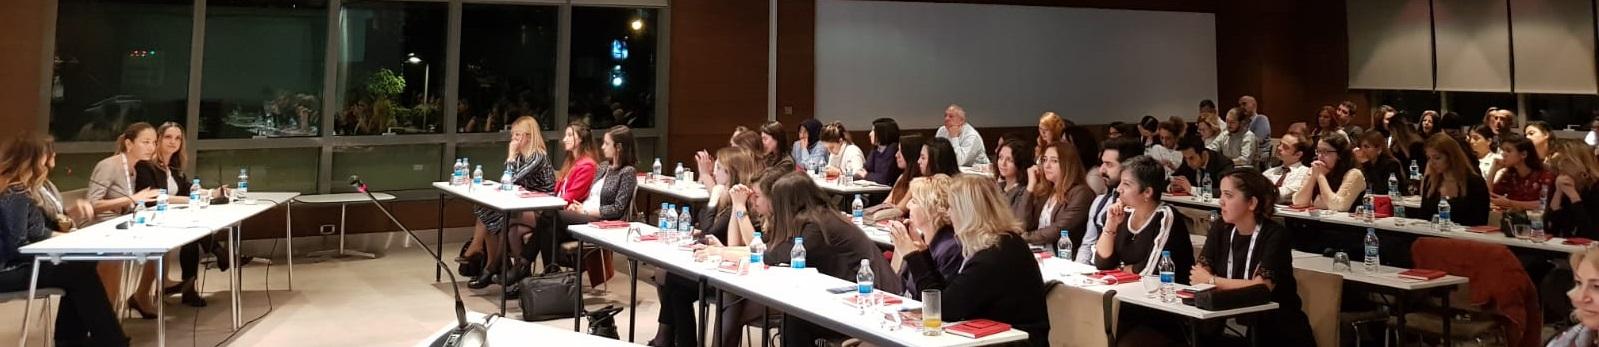 SheLeadsTech ISACA Istanbul Etkinliği